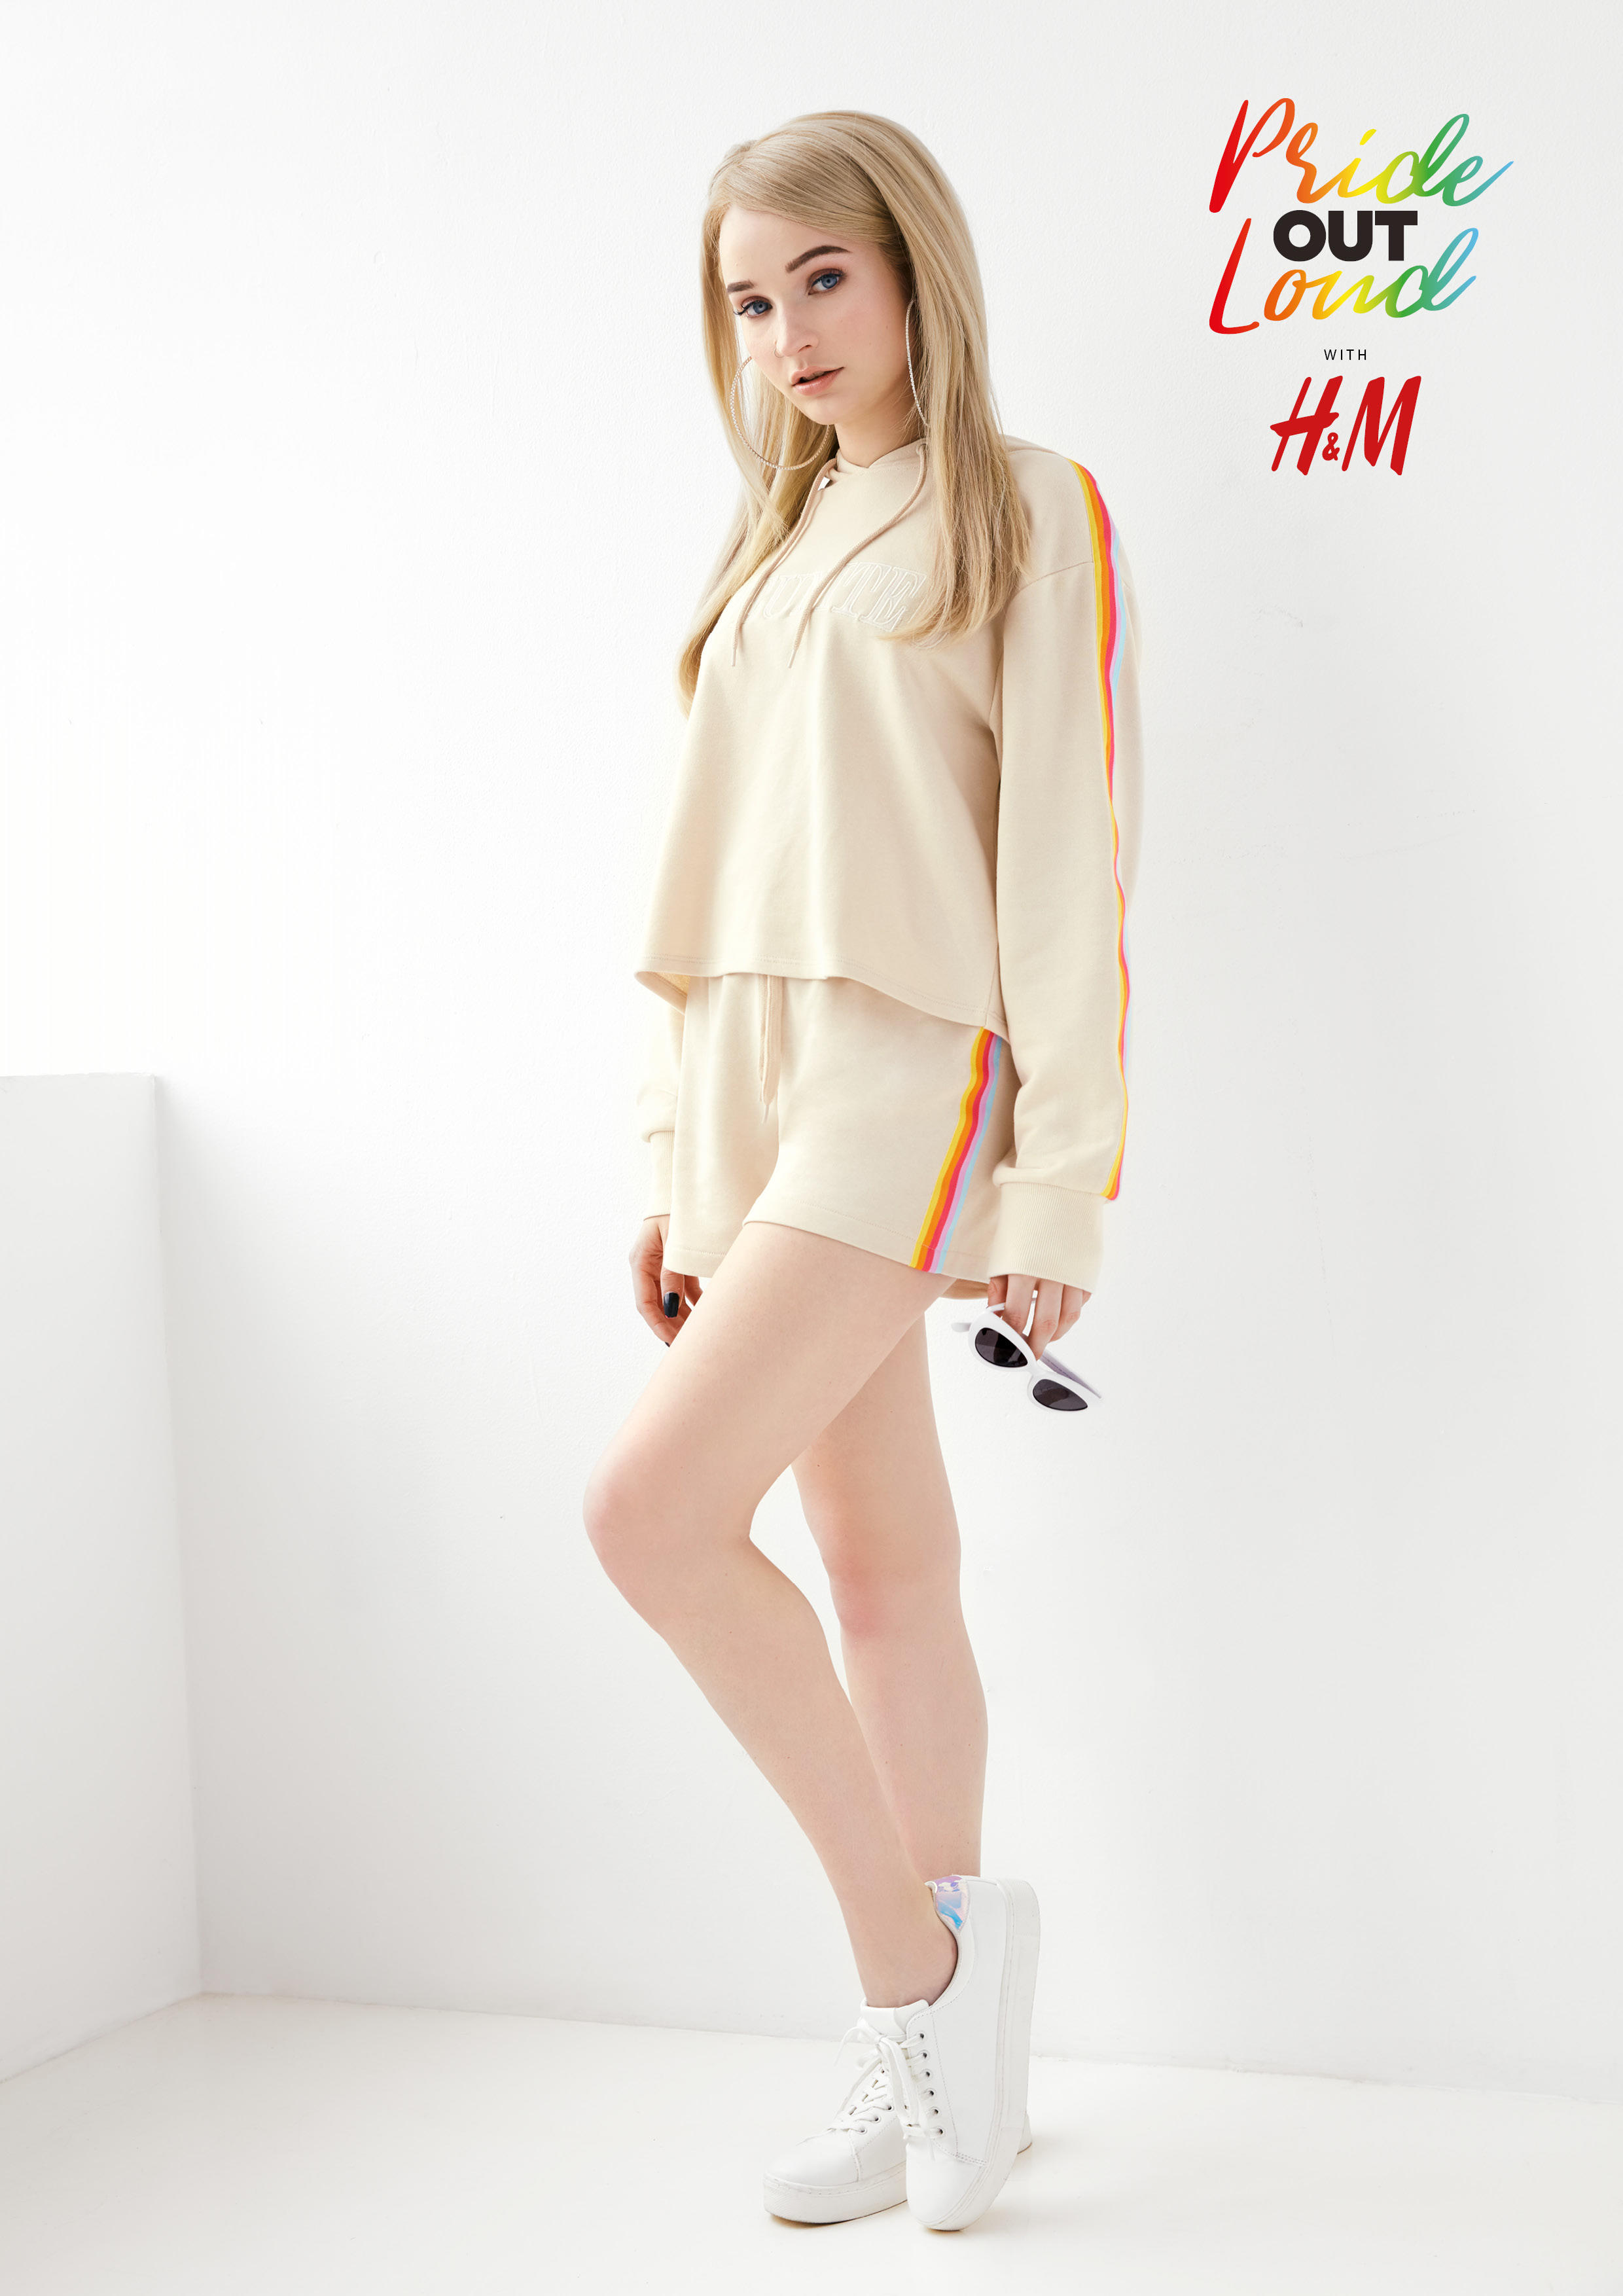 H&M image 11